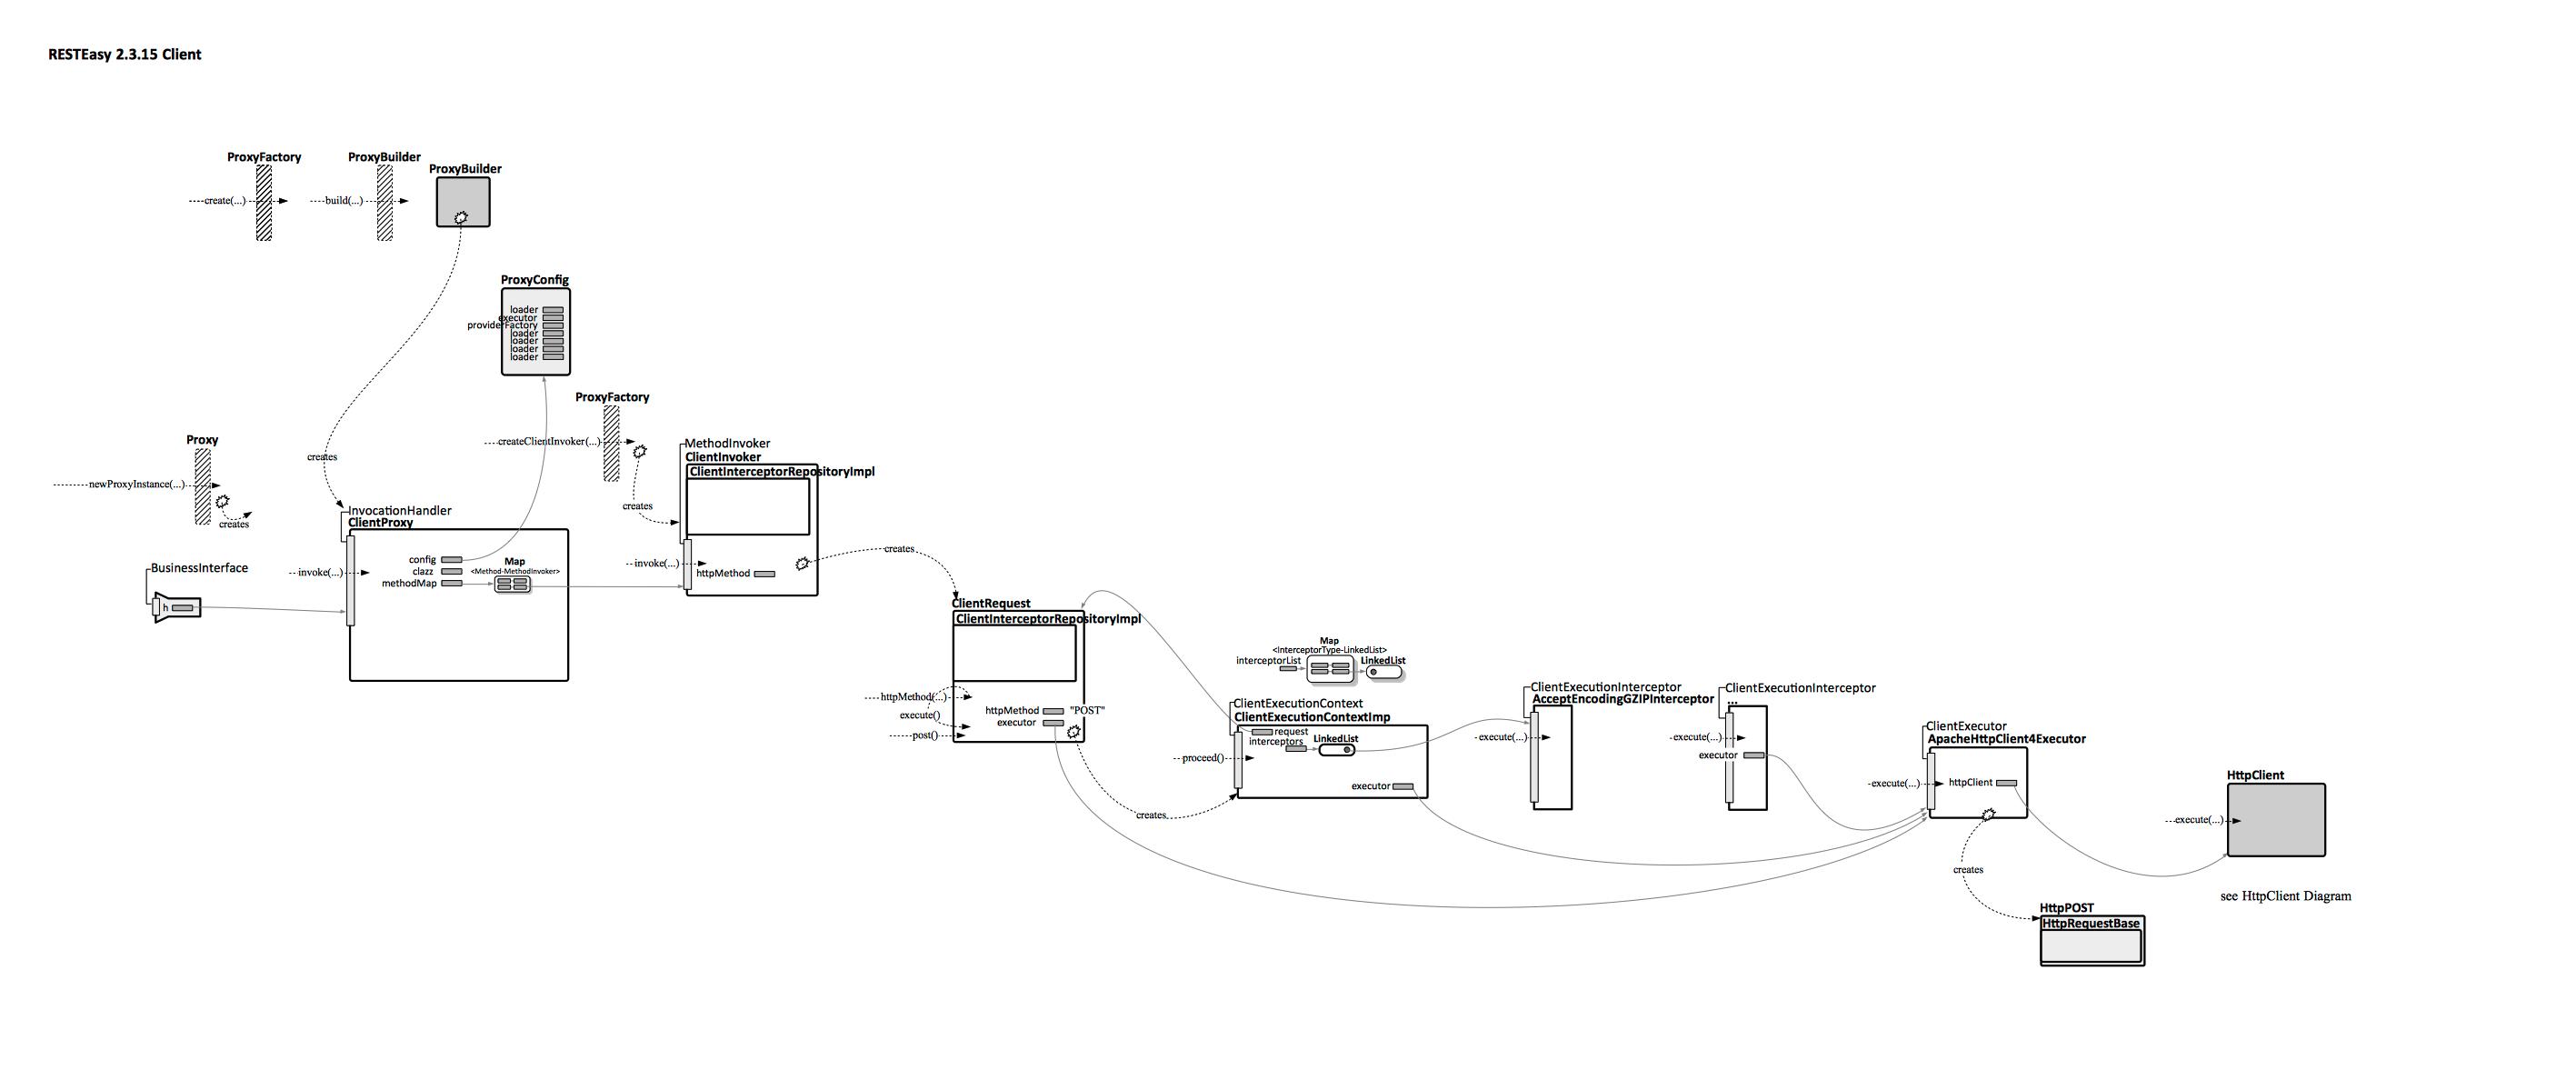 Resteasy 2315 client architectural diagram novaordis knowledge diagram pooptronica Images